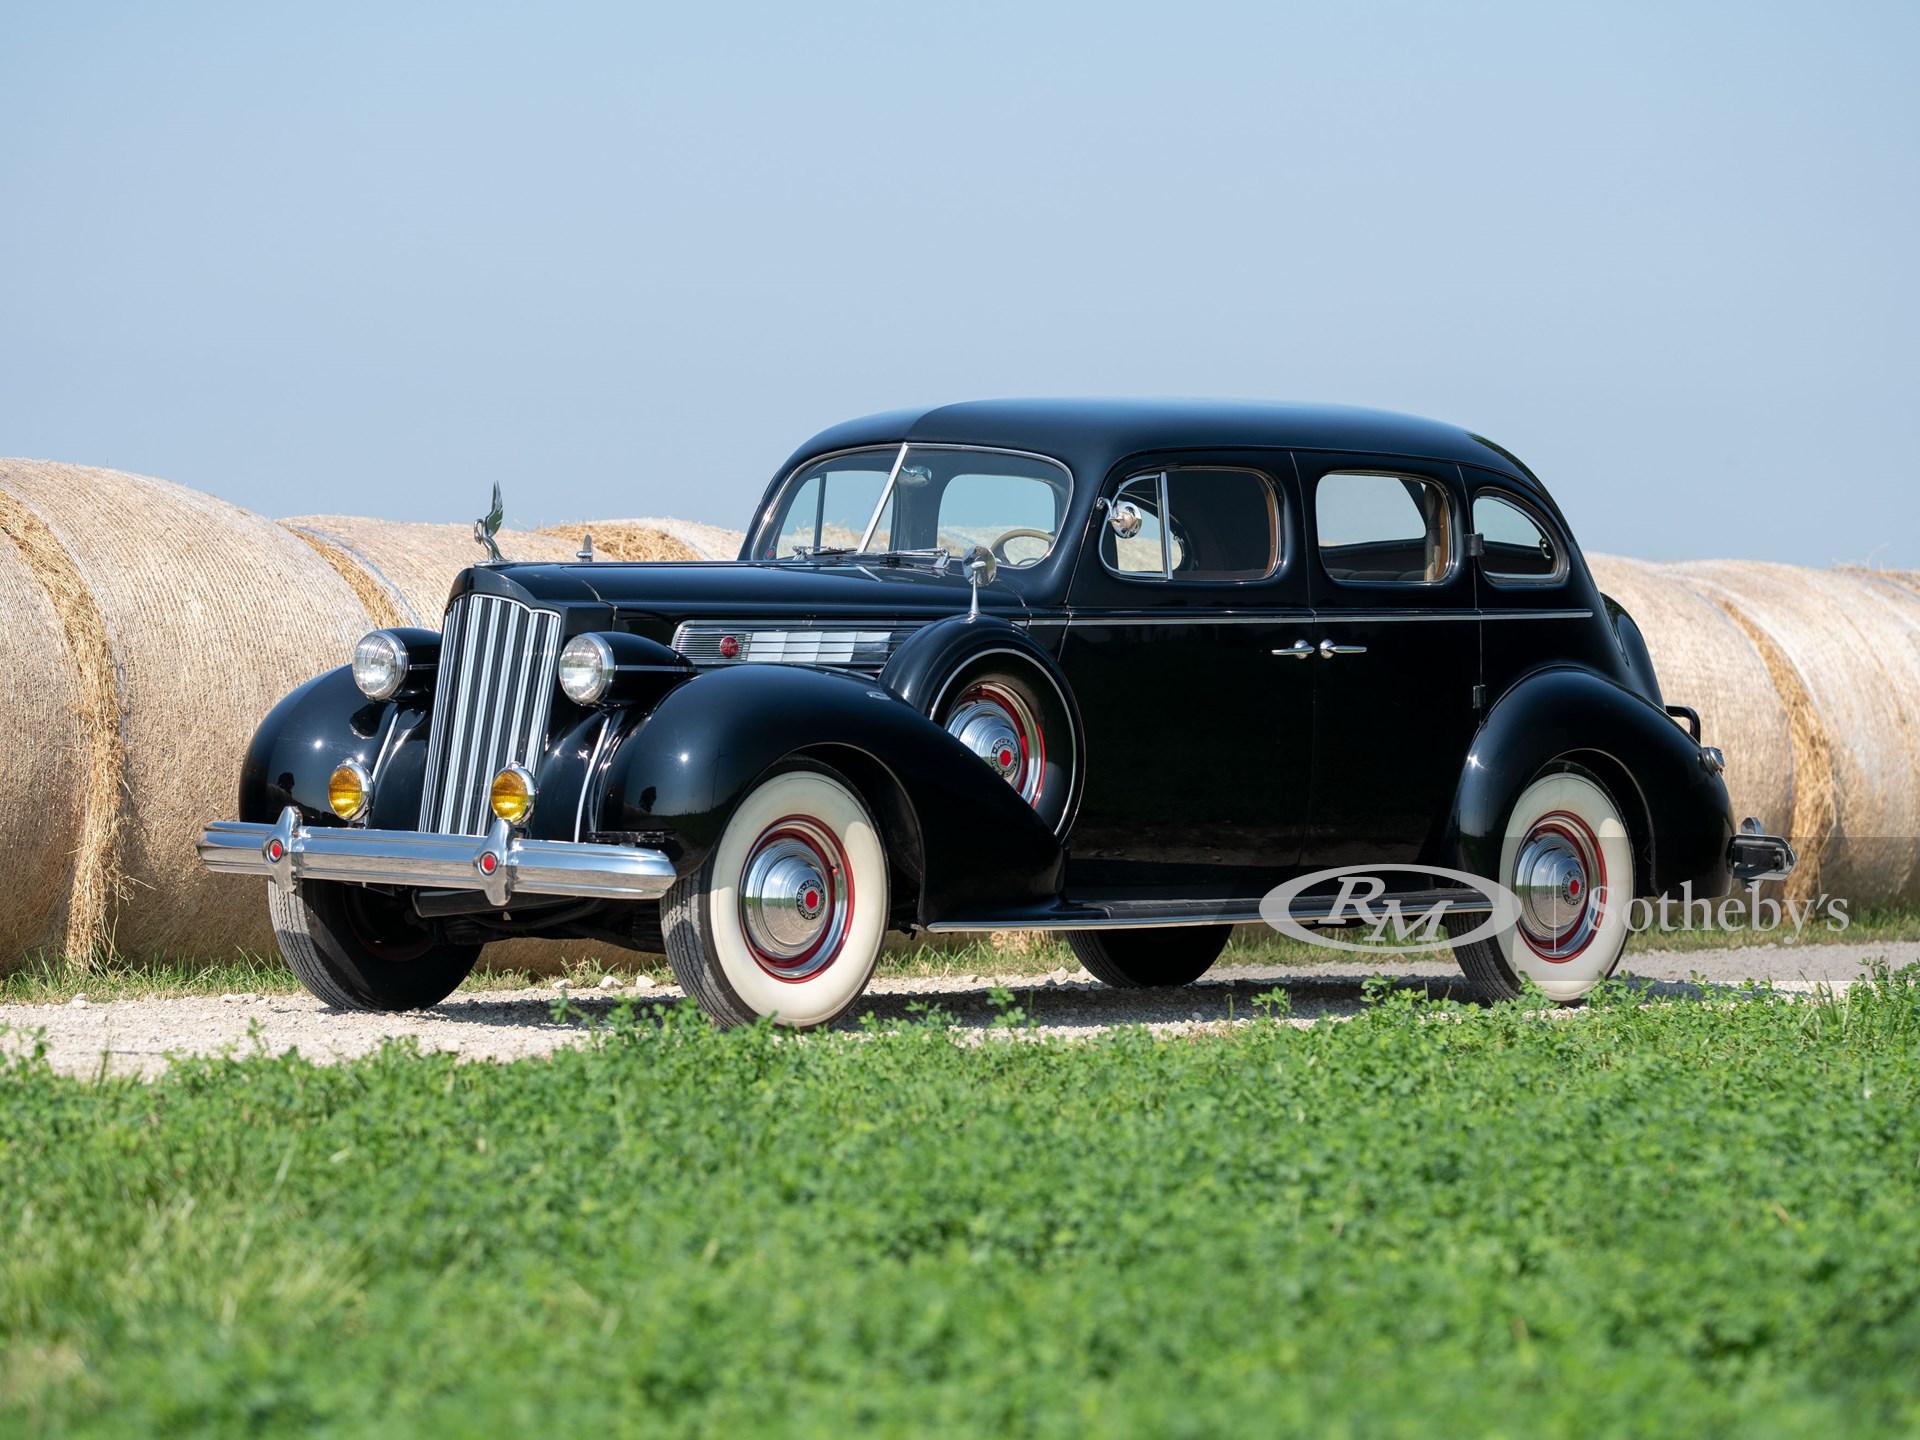 1939 Packard Super Eight Touring Sedan